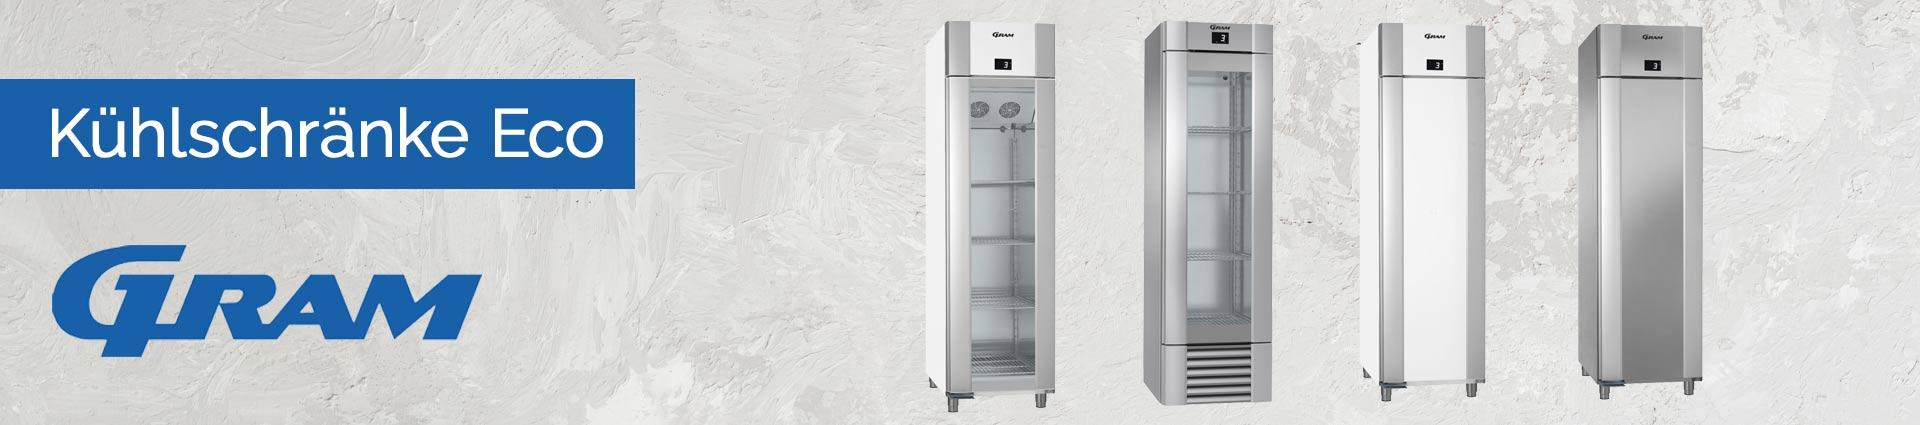 GRAM Kühlschränke Eco Banner